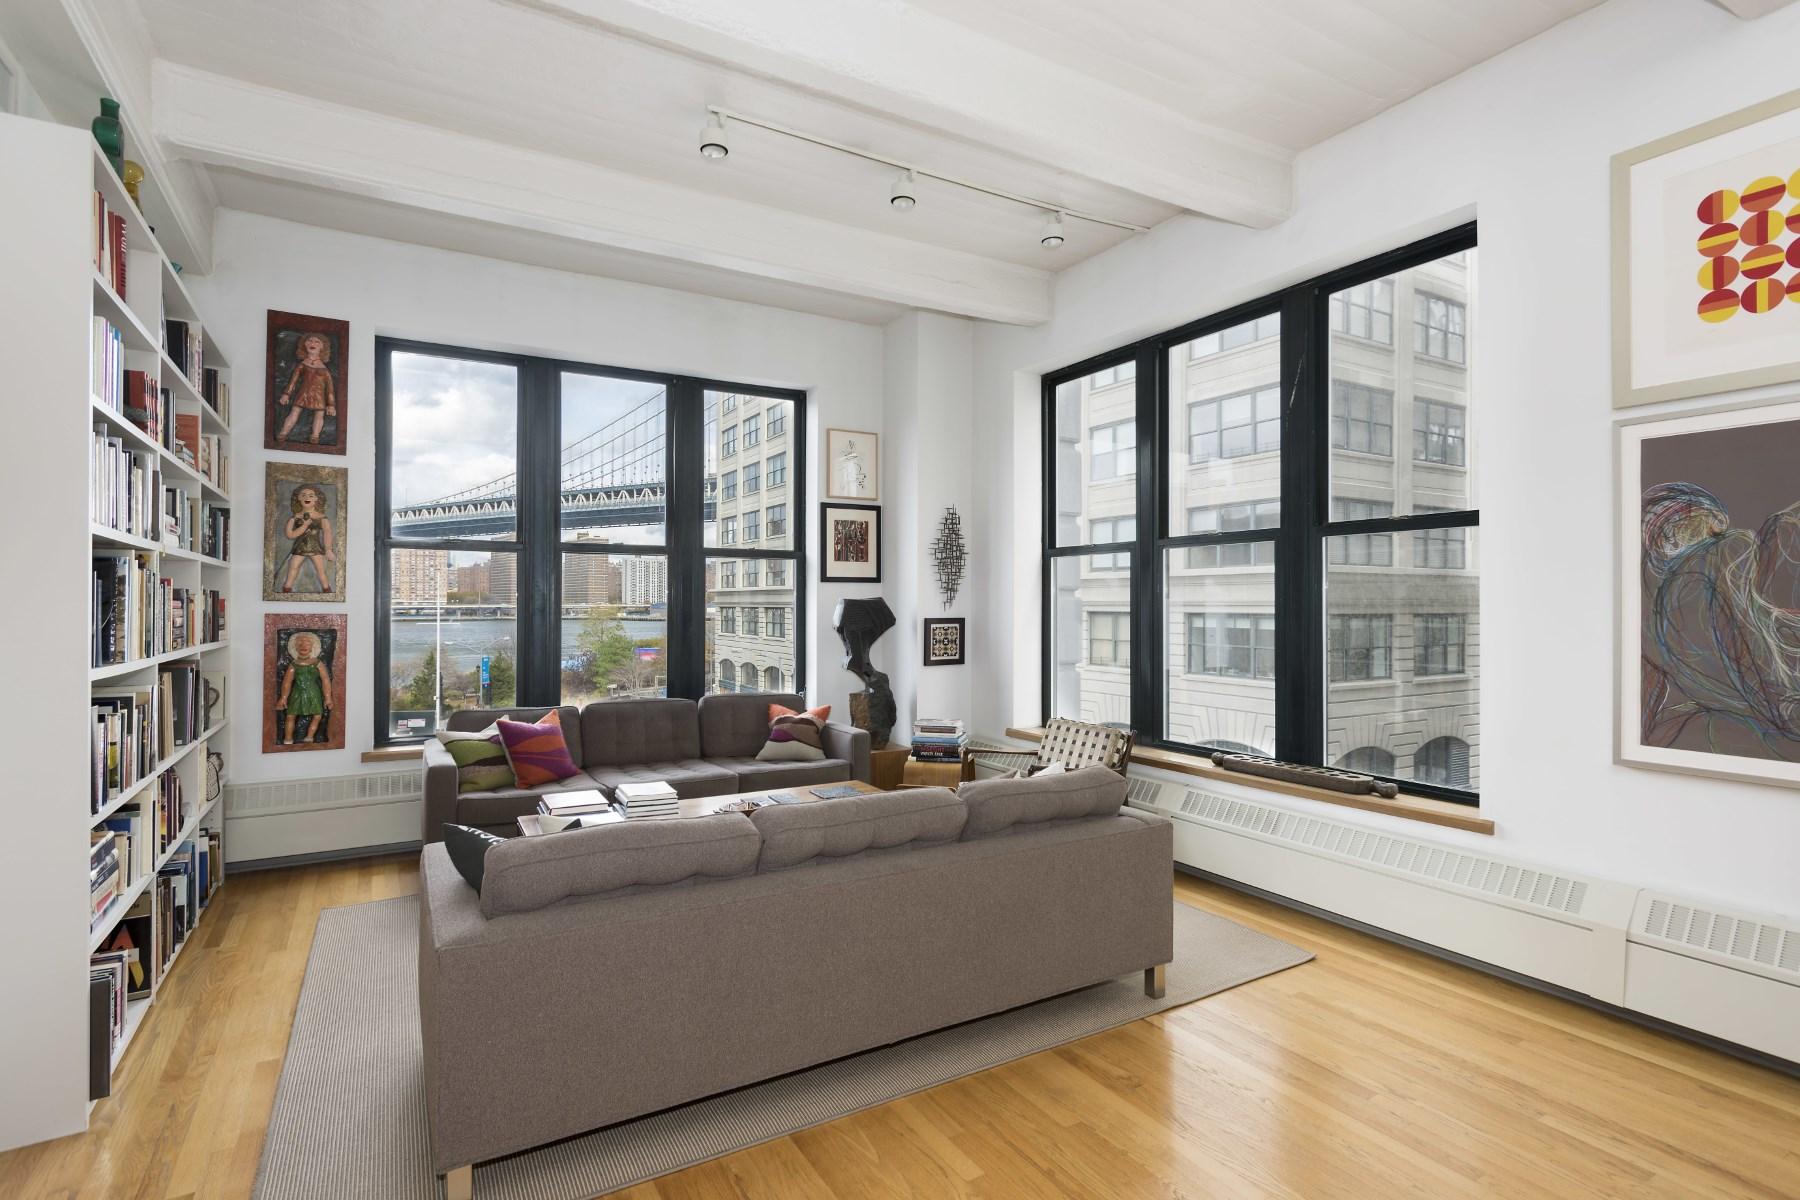 Condominium for Rent at SENSATIONAL 3 BED SWEENEY LOFT 30 Main Street Apt 4B Brooklyn, New York 11201 United States